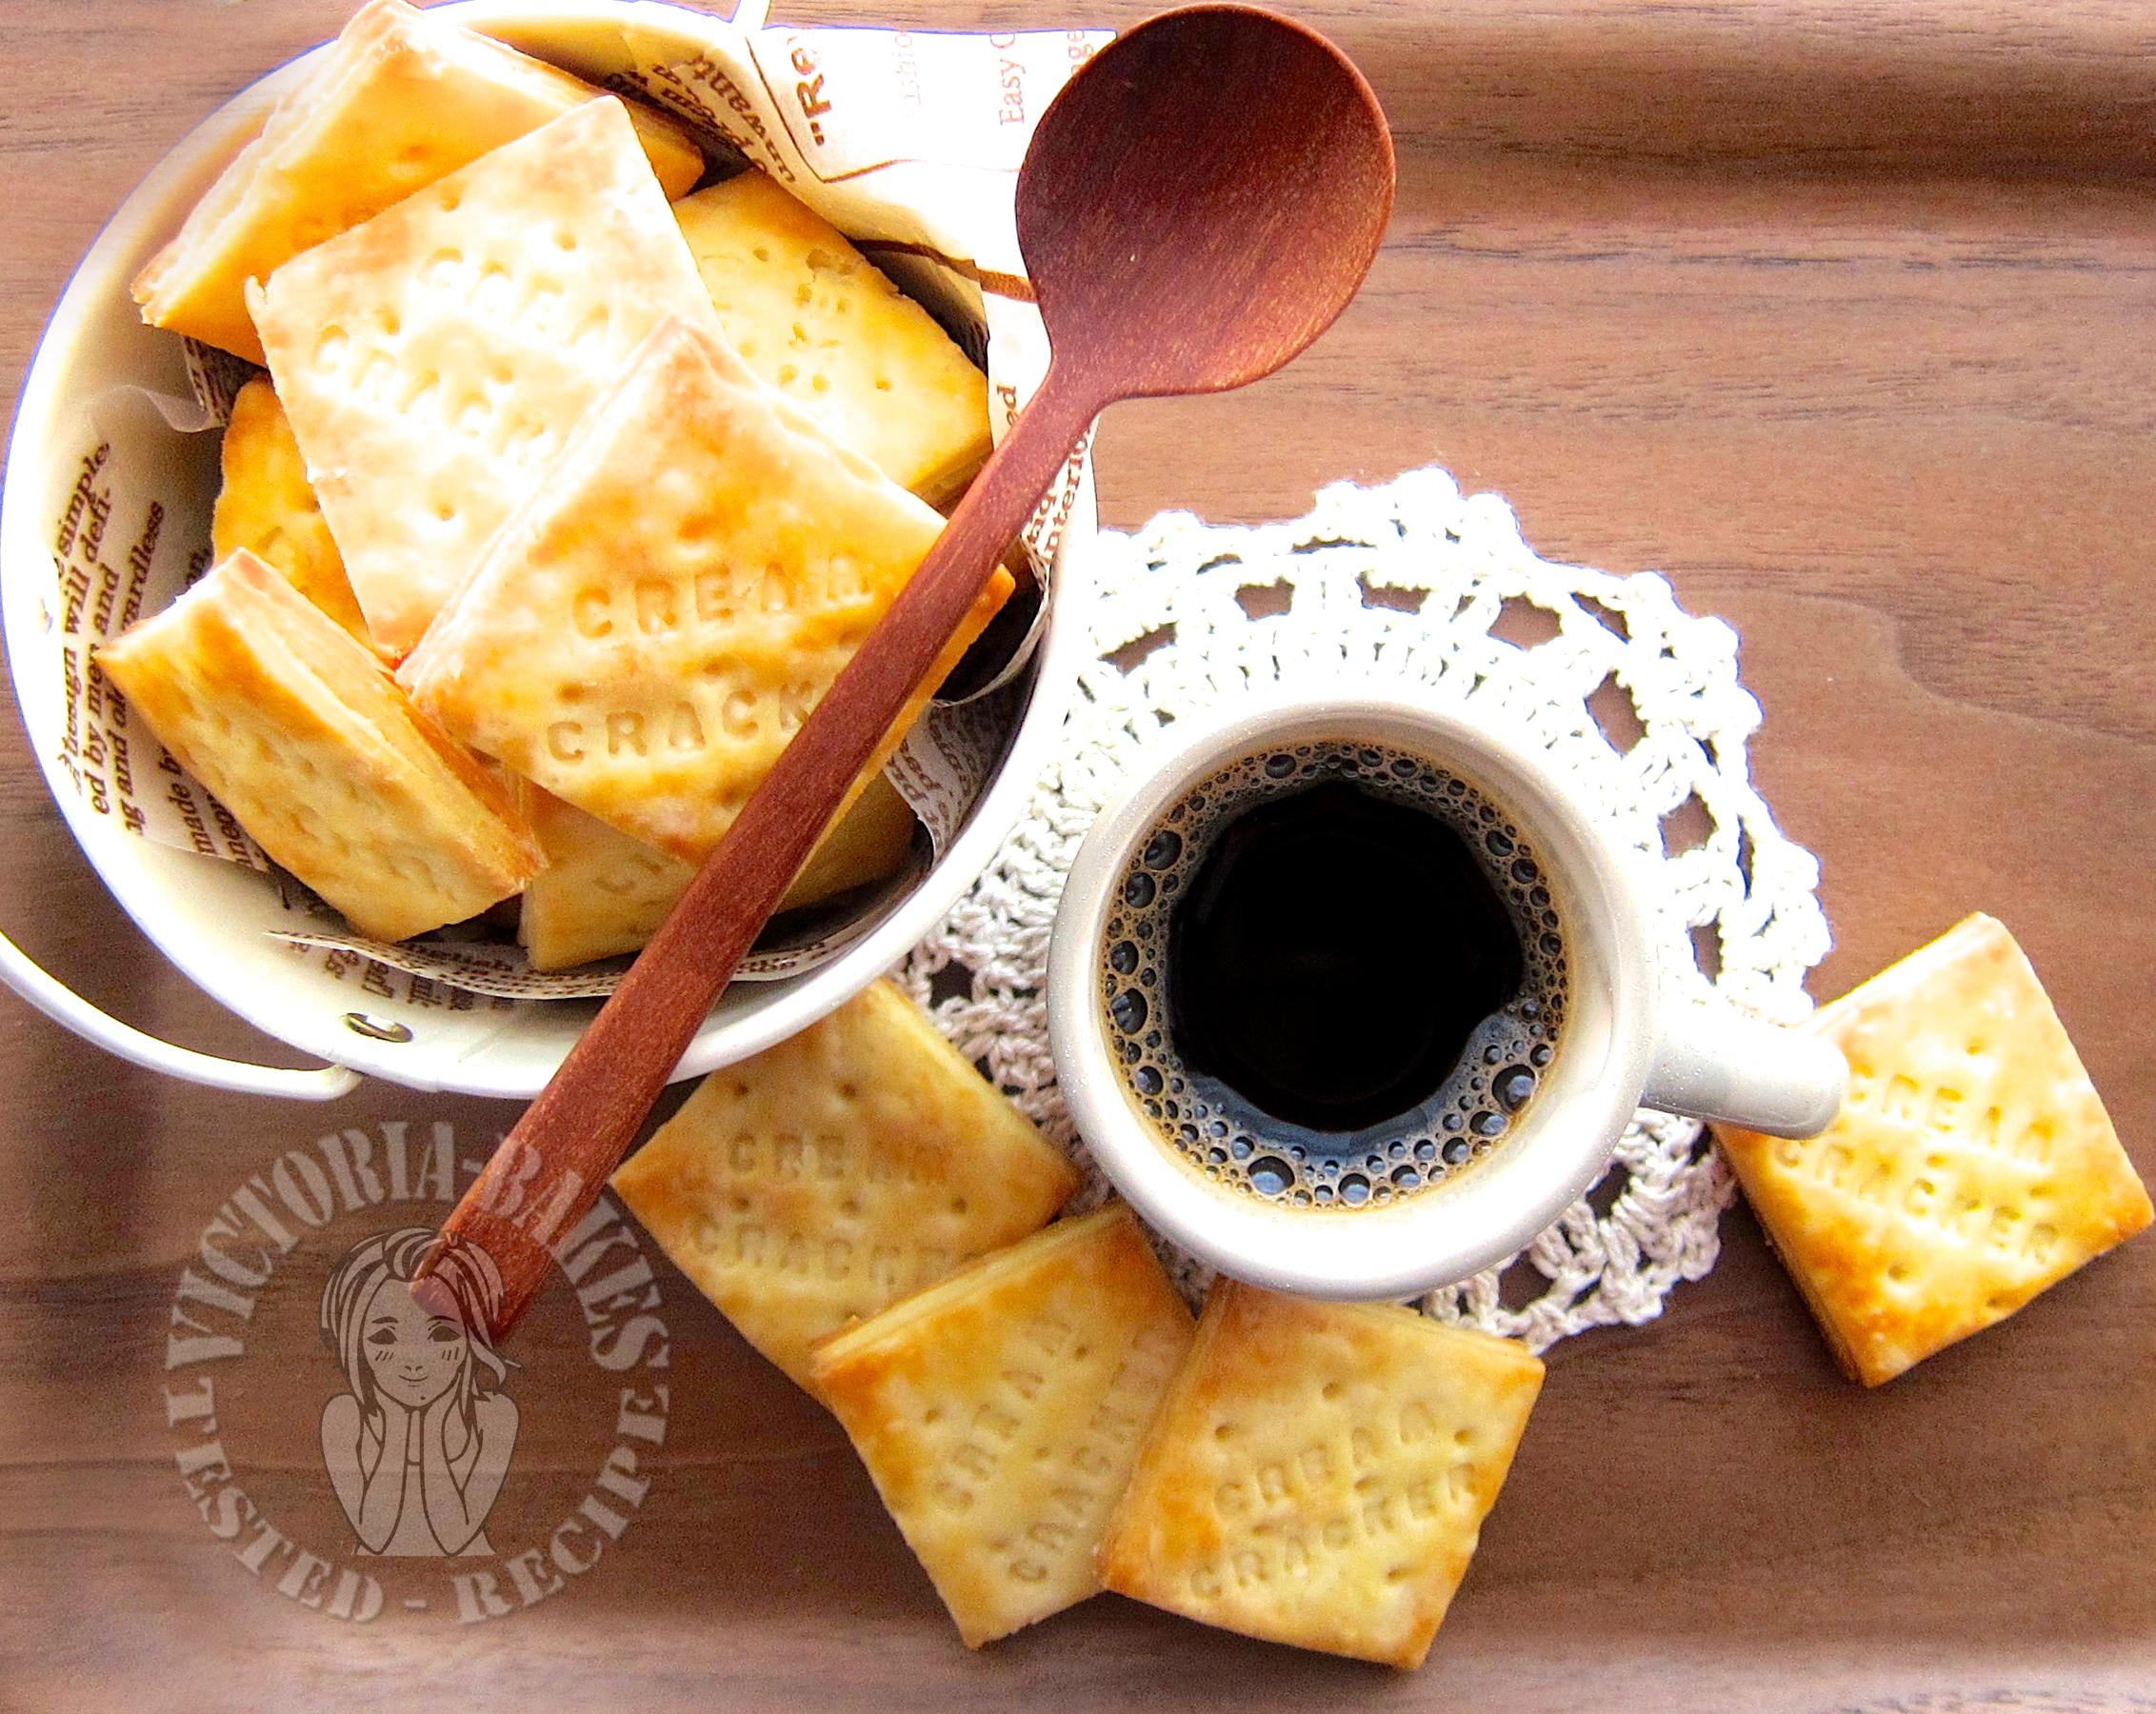 sugarless cream crackers 无糖奶盐苏打饼干 ( ˘ ³˘)❤